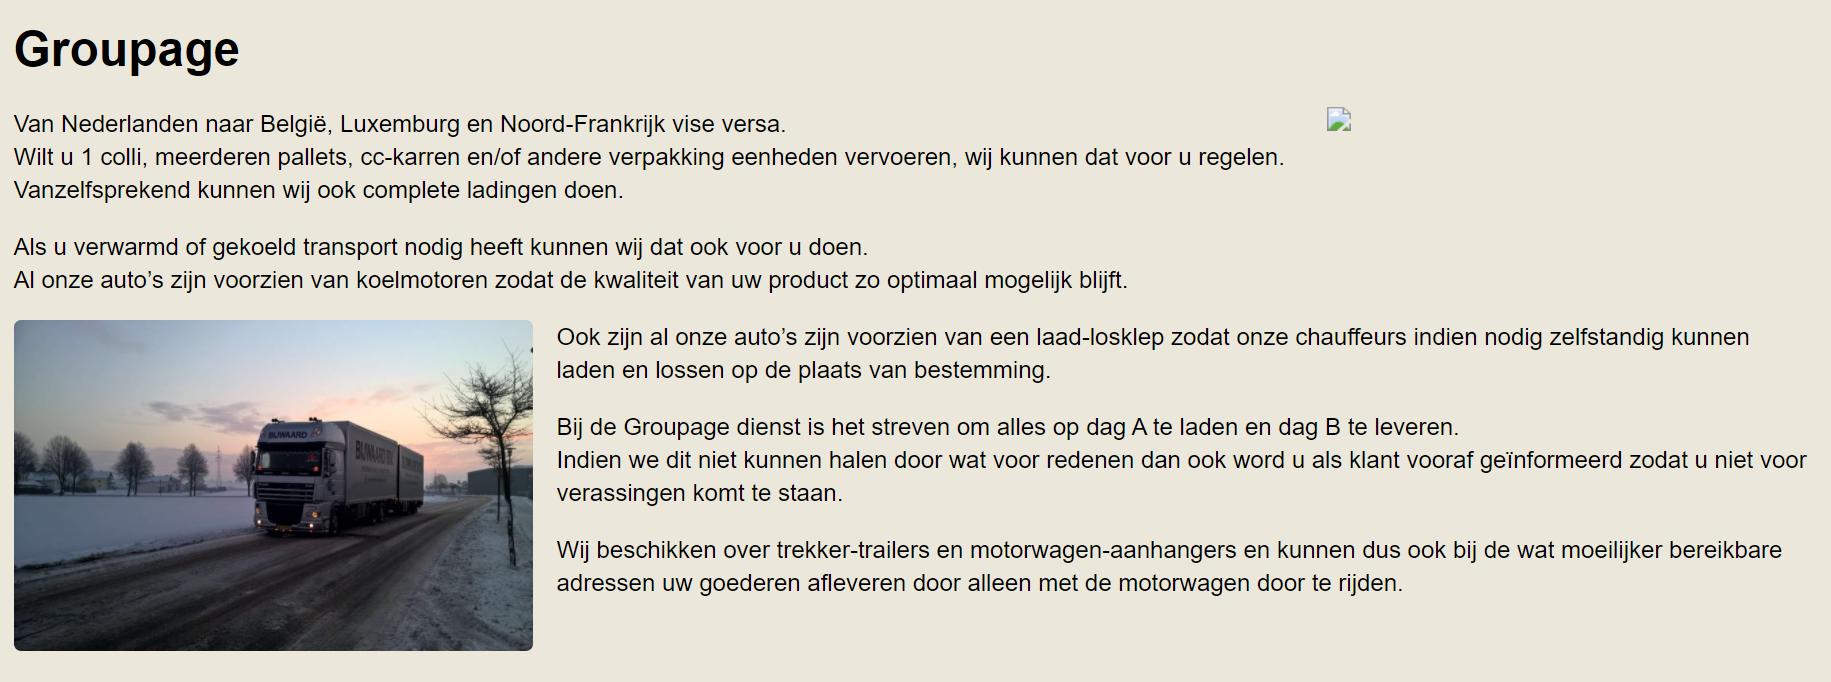 Groupage-(2)